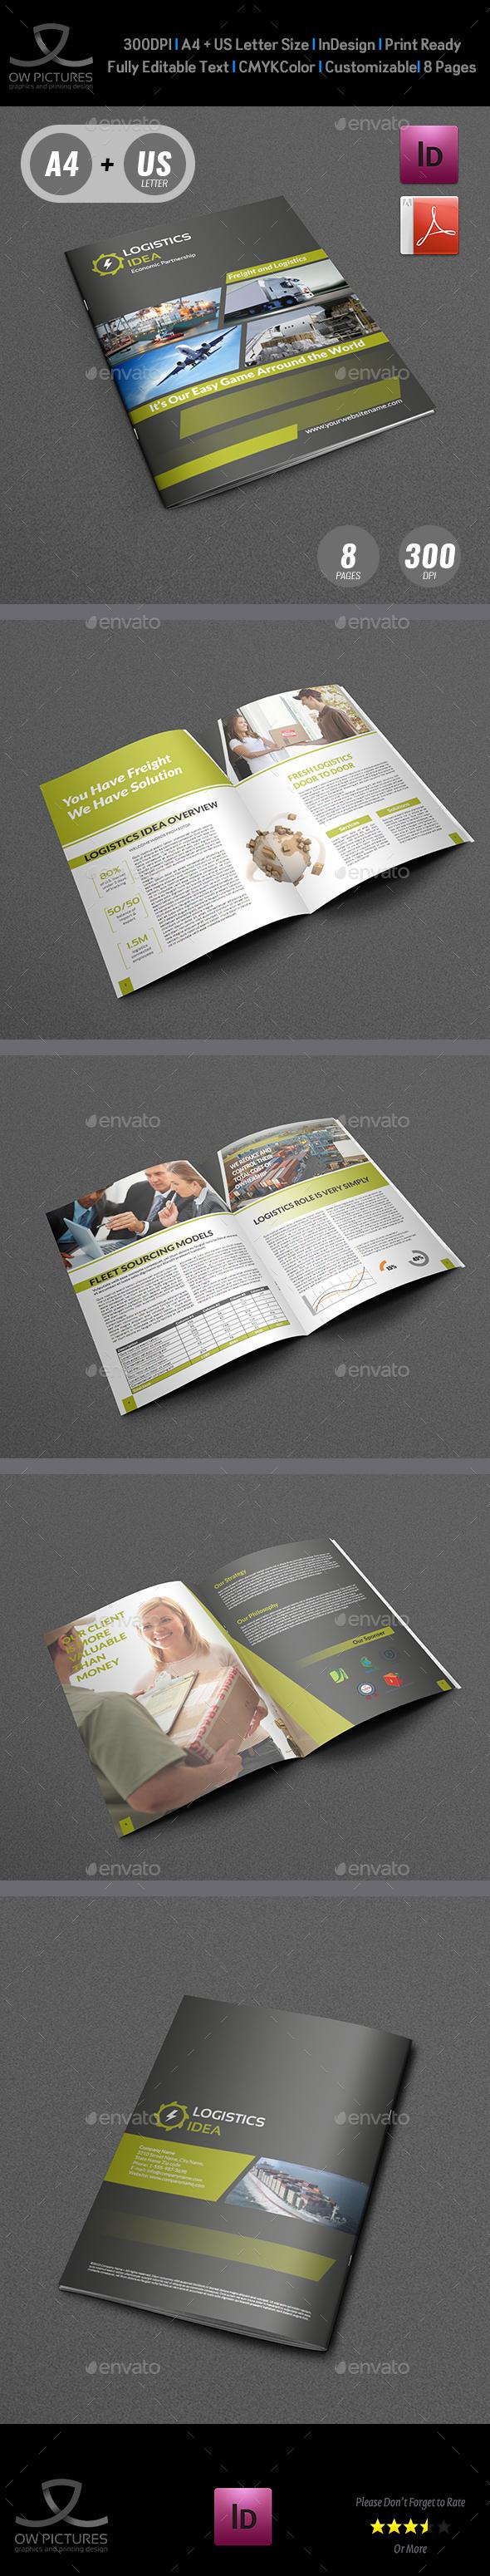 Logistics Services Brochure - 8 Pages - Brochures Print Templates